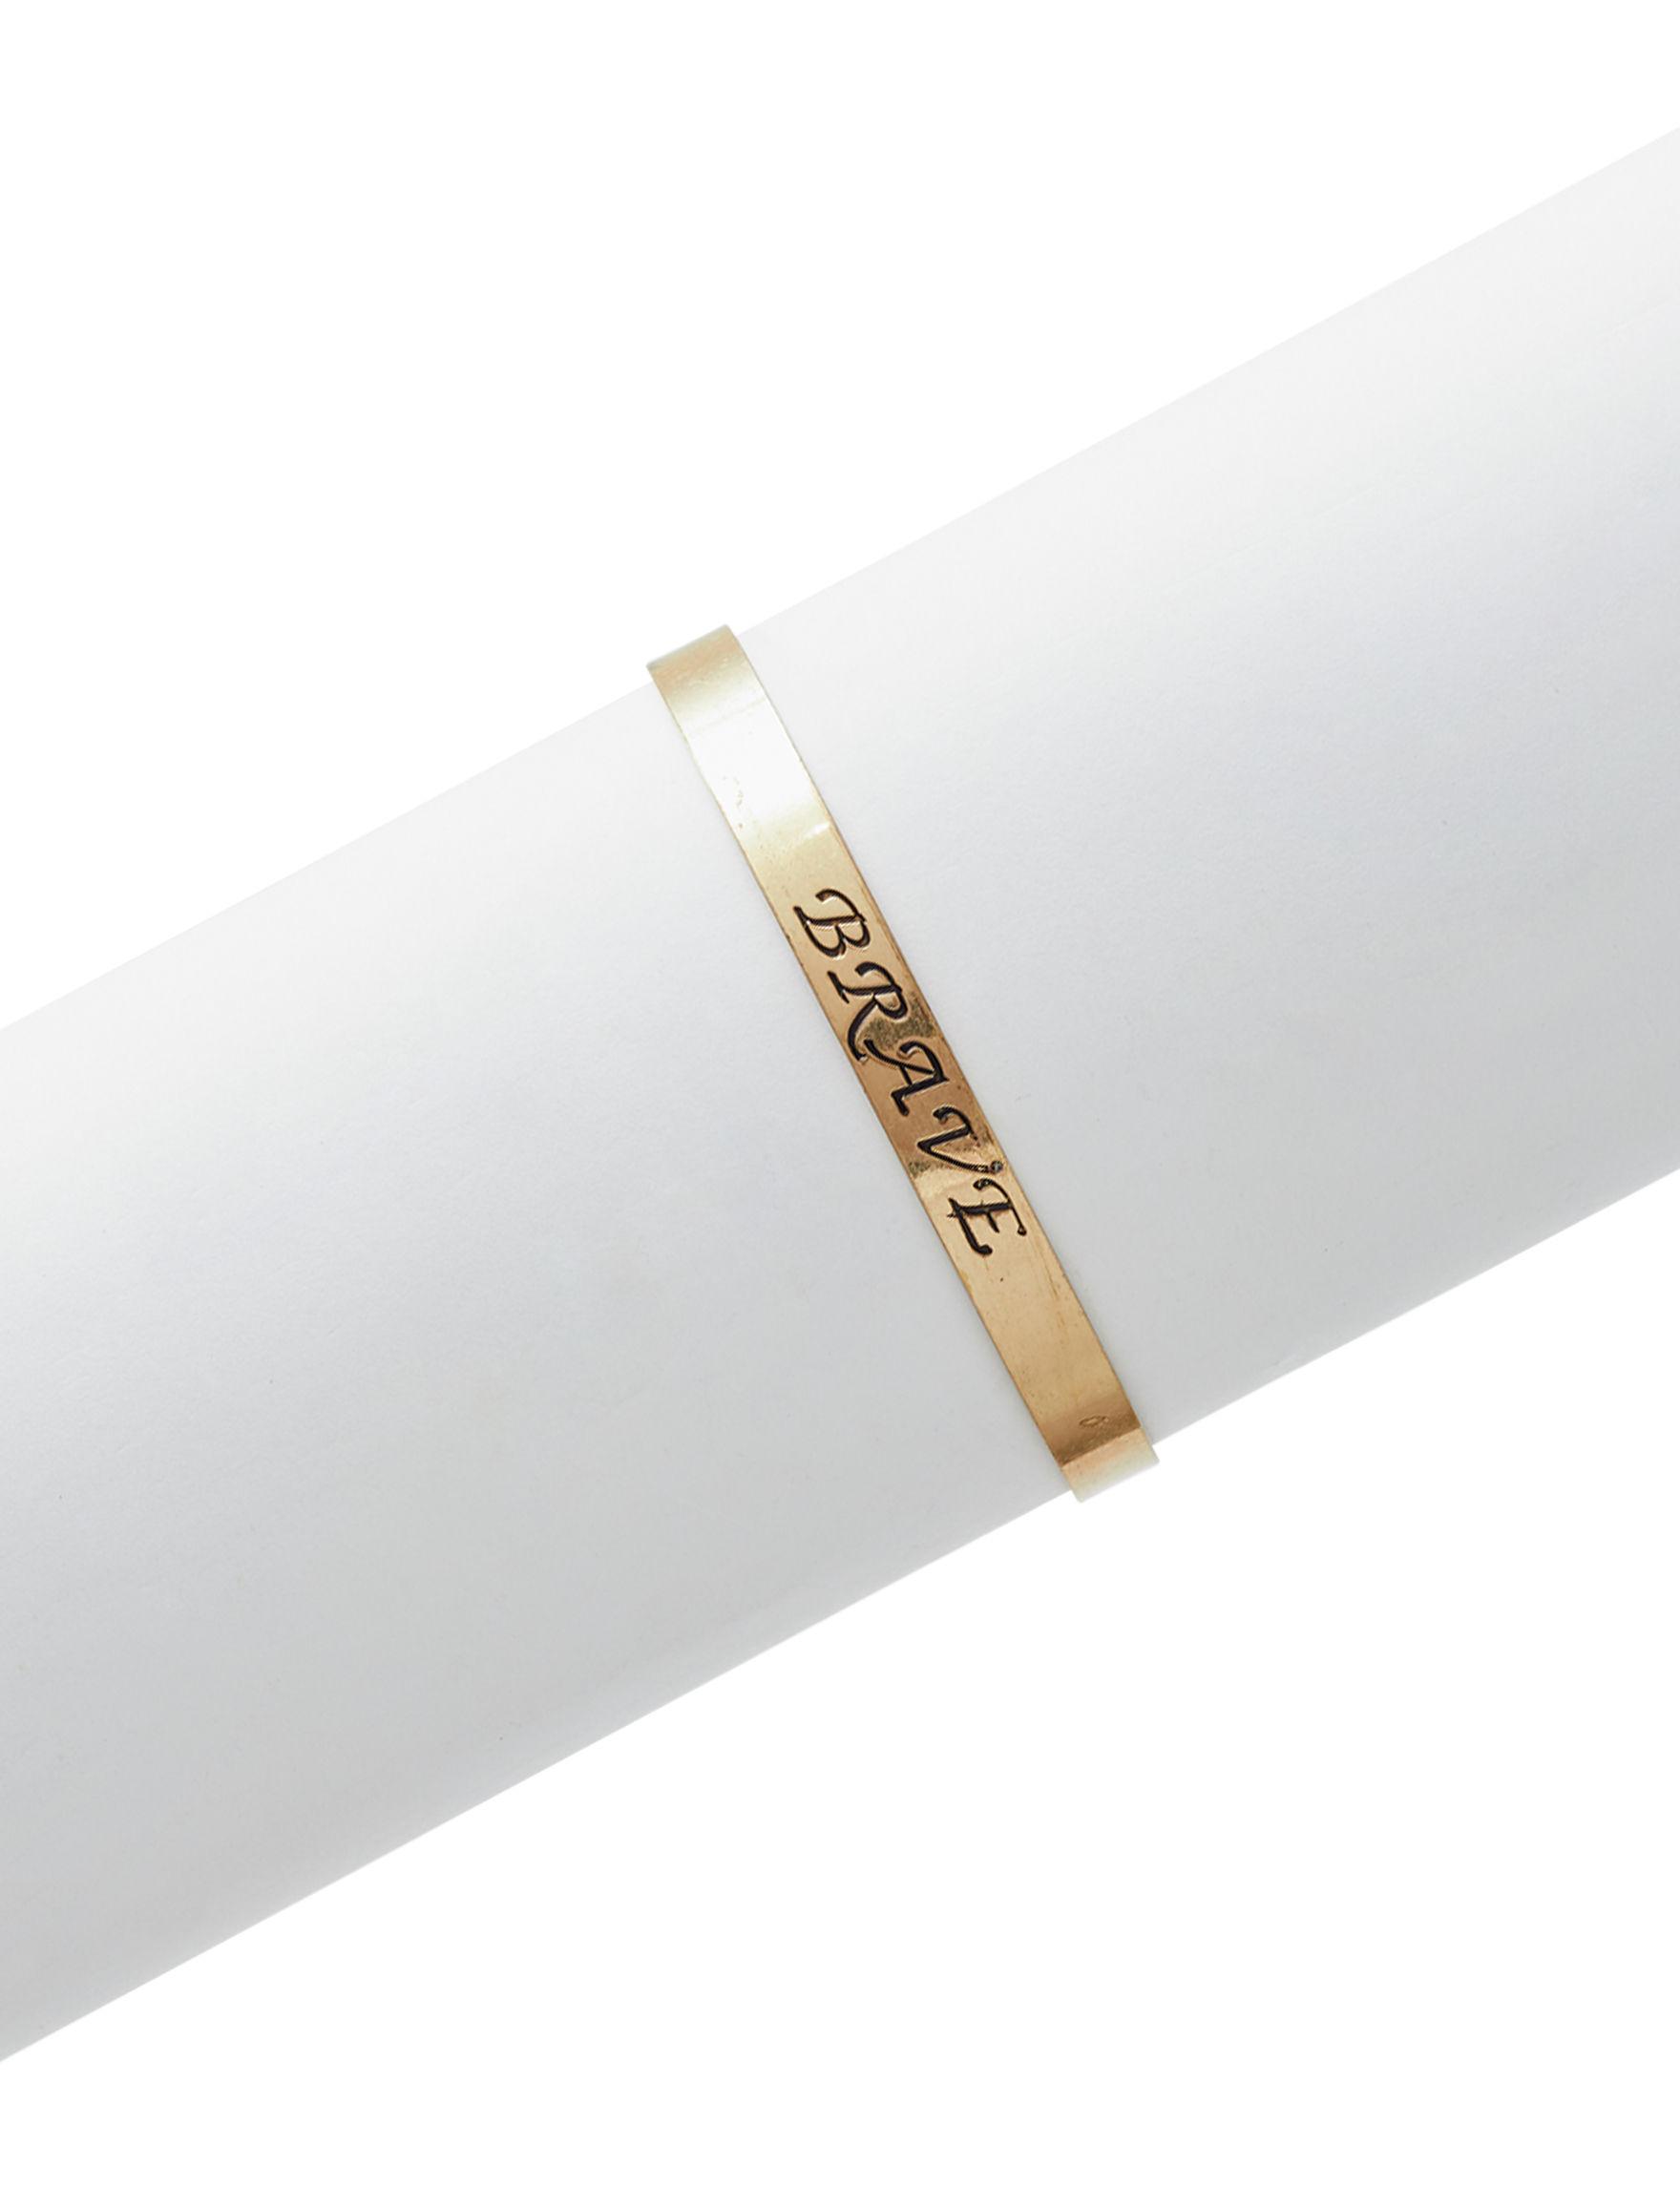 Tanya Gold Bracelets Fashion Jewelry